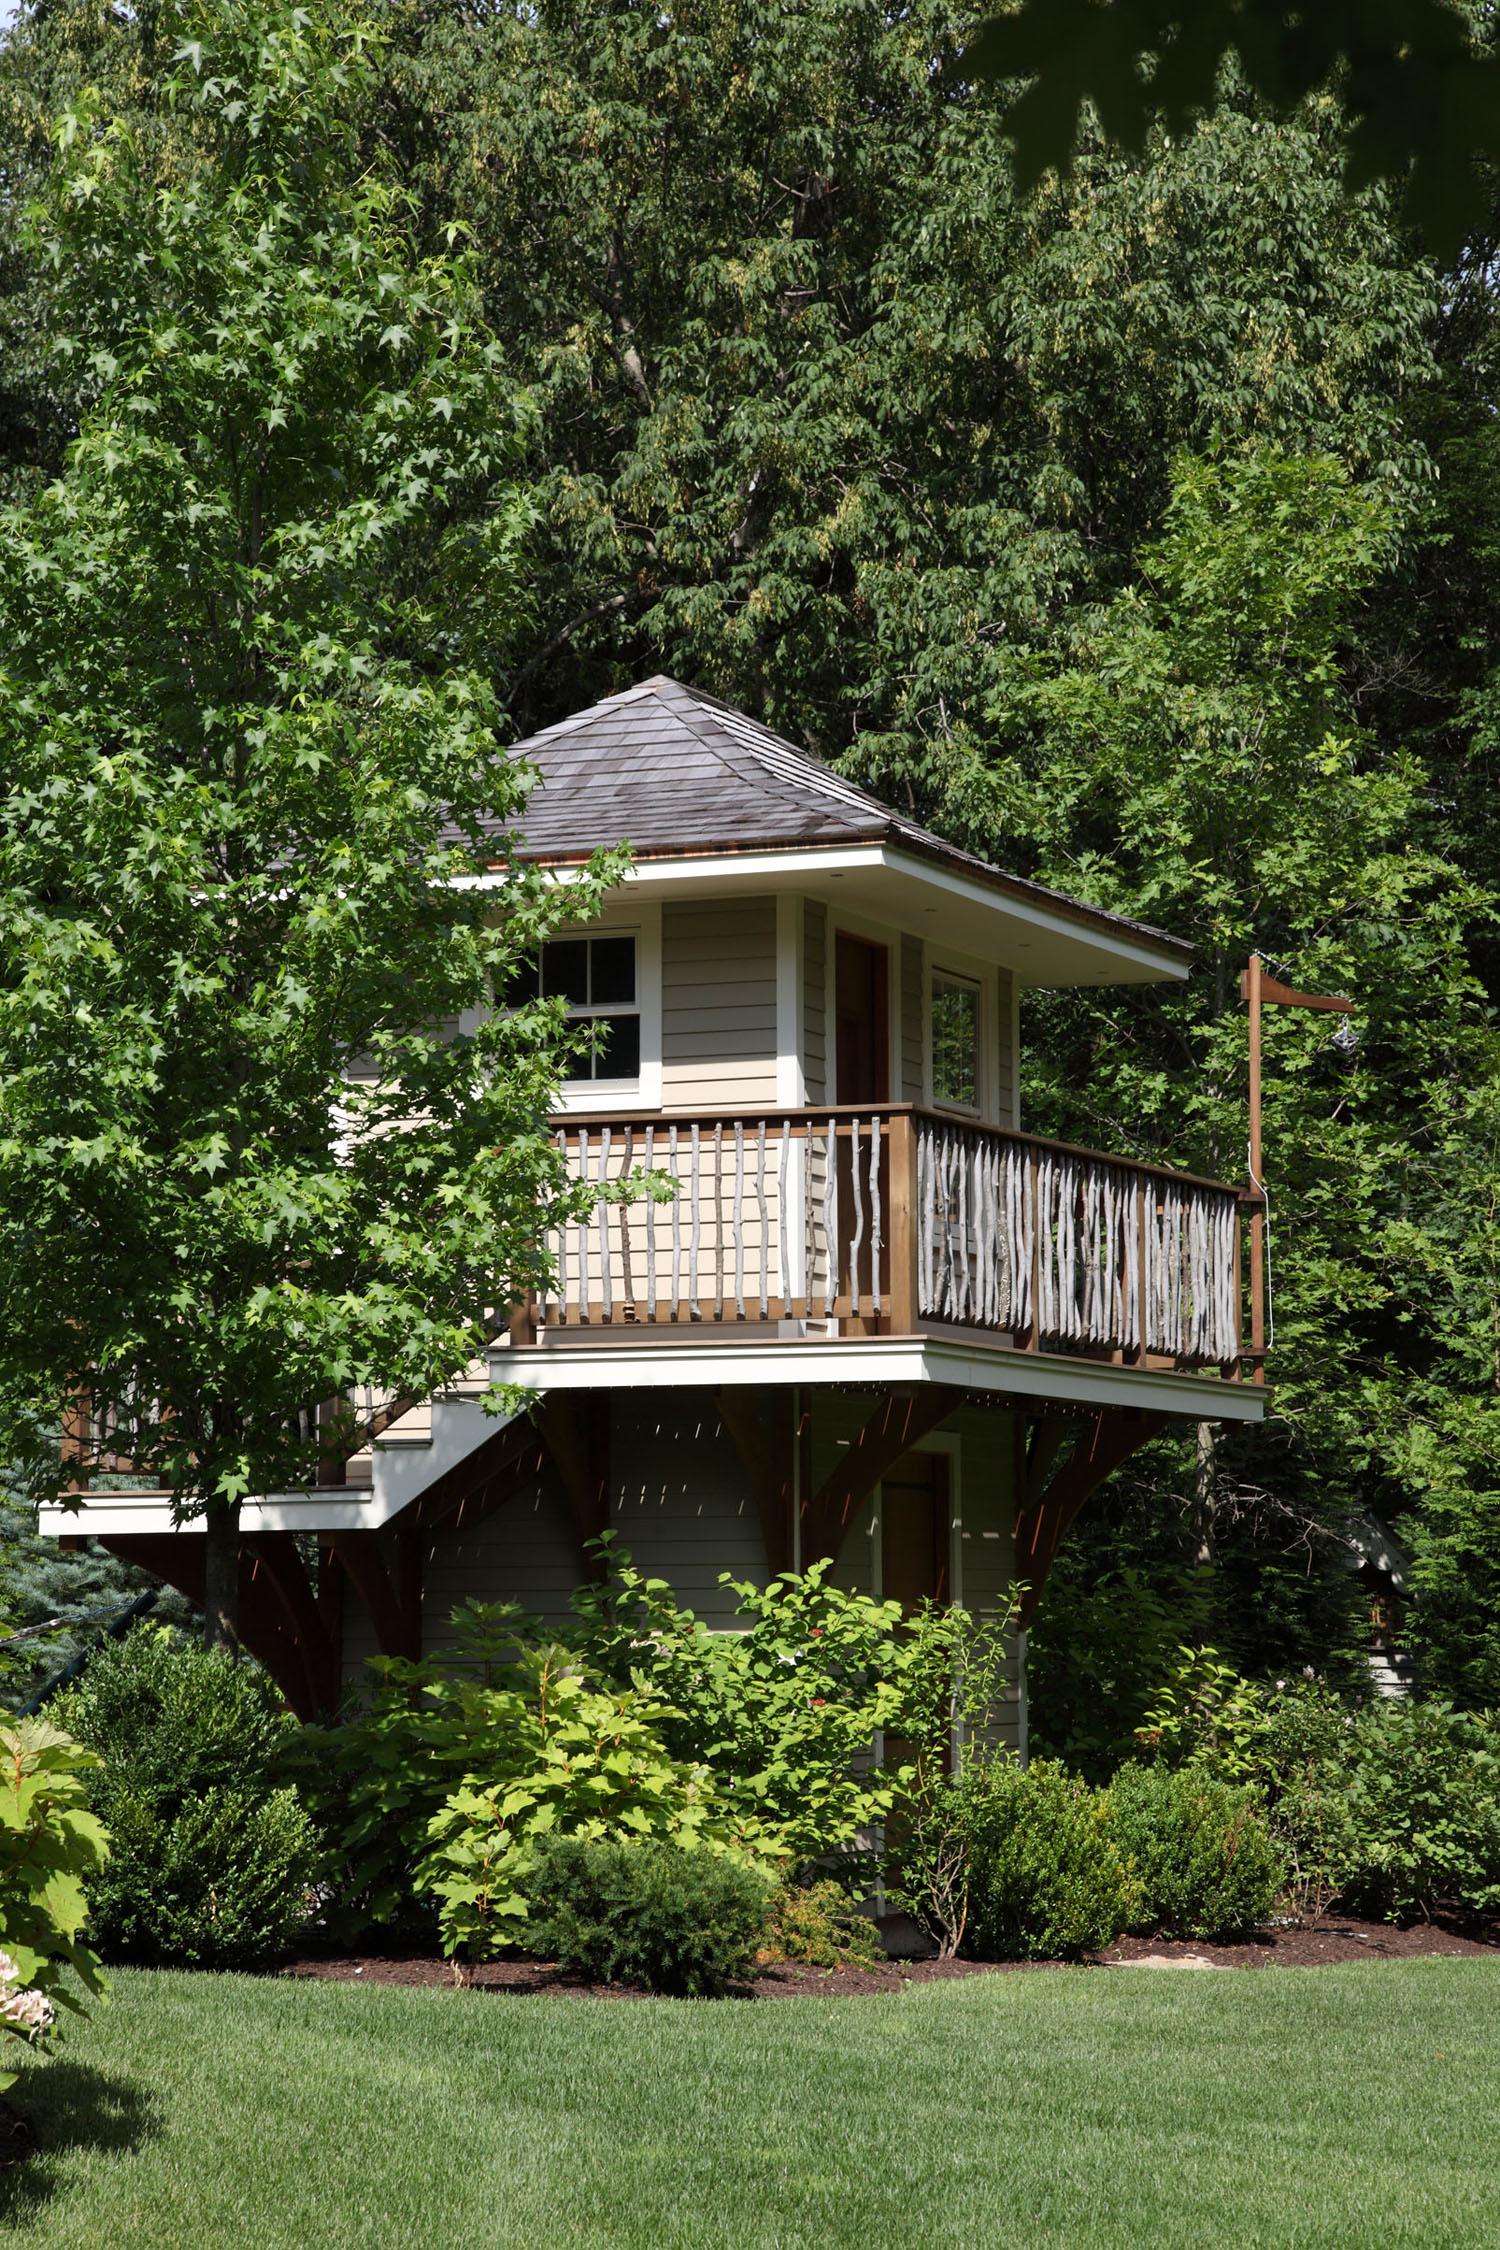 MG_treehouse side 1500pix.jpg